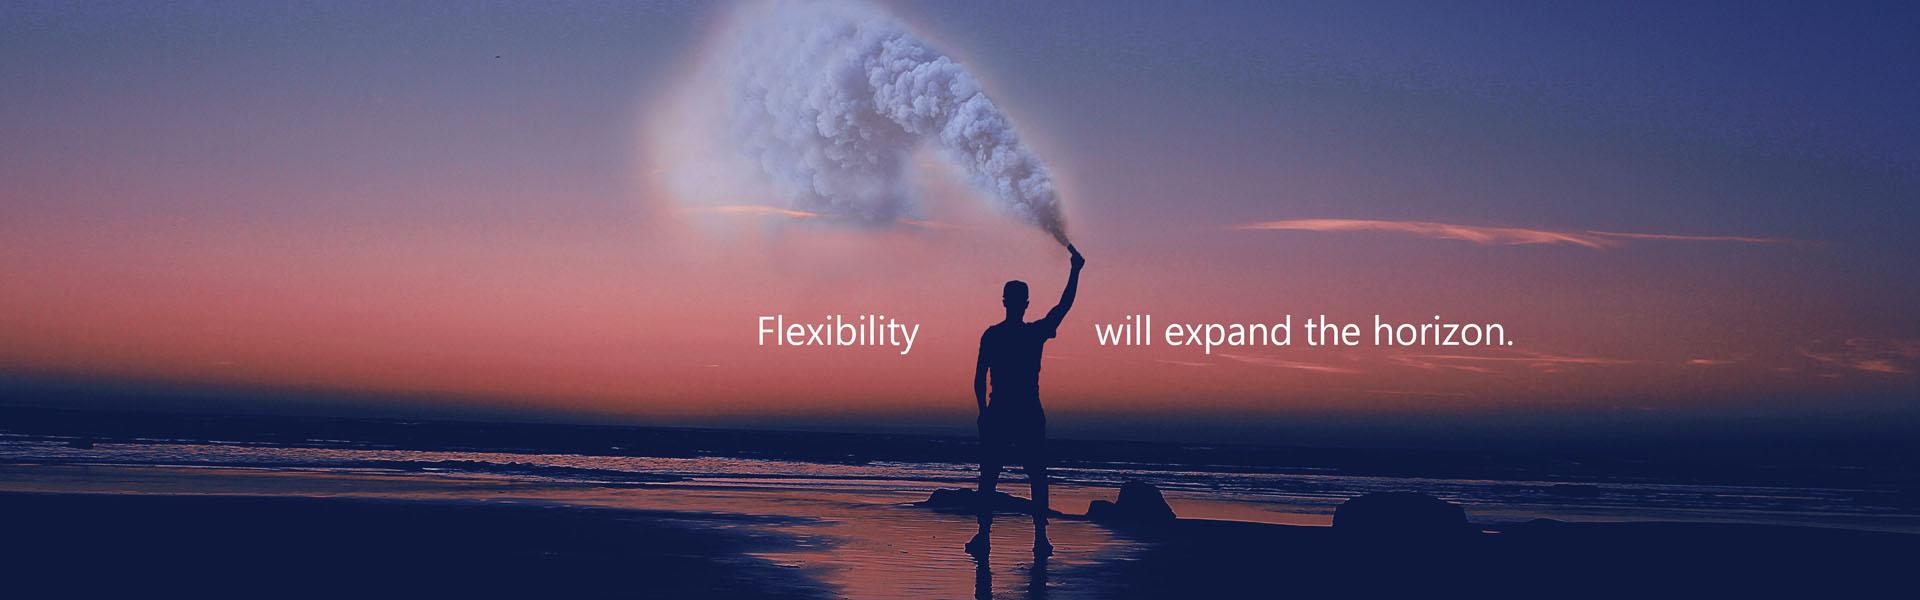 us_7nsqPSnYCoY_1920x600_flexibility